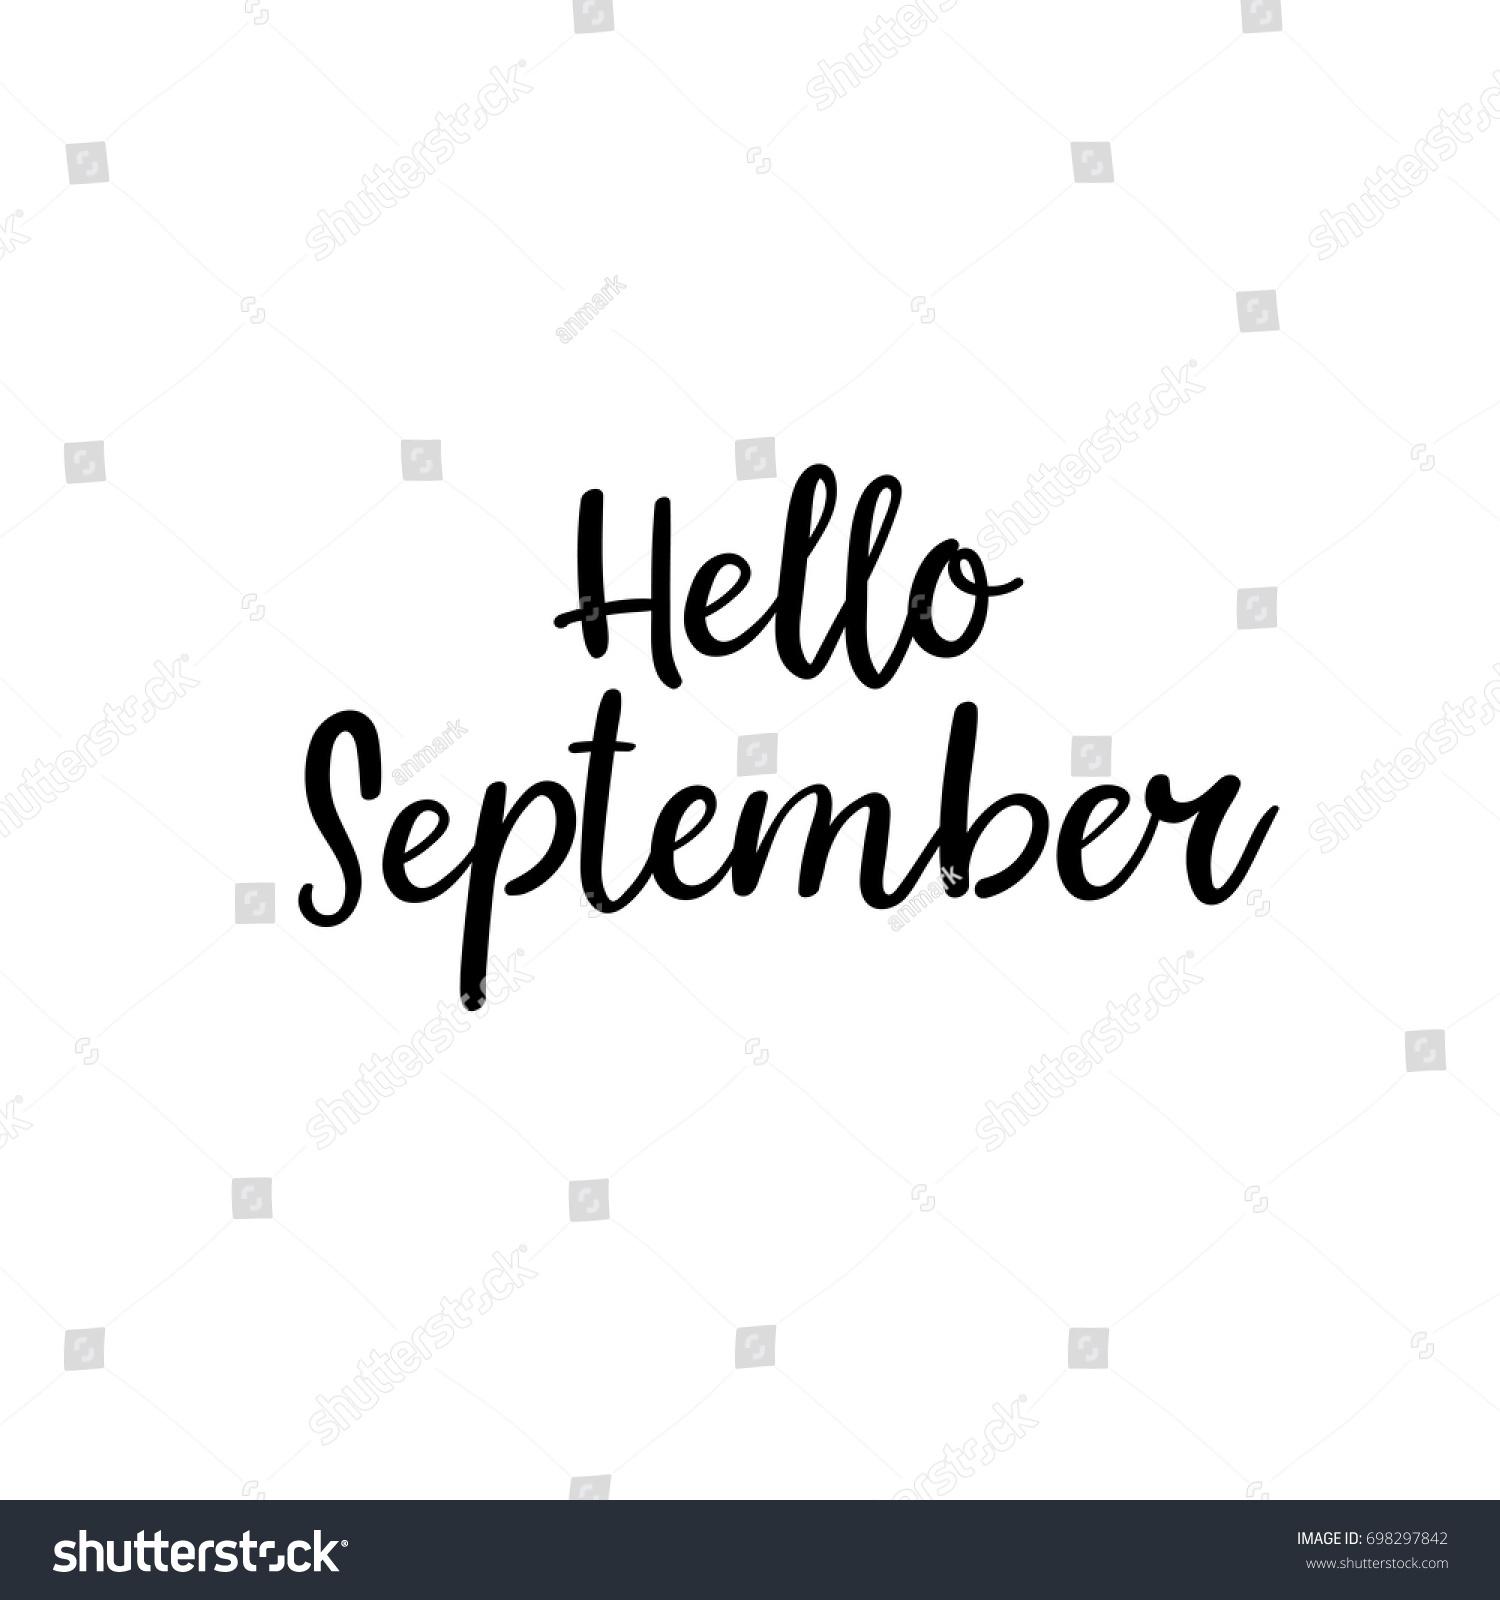 Hello September Calligraphy Inscription Autumn Greeting Stock ...